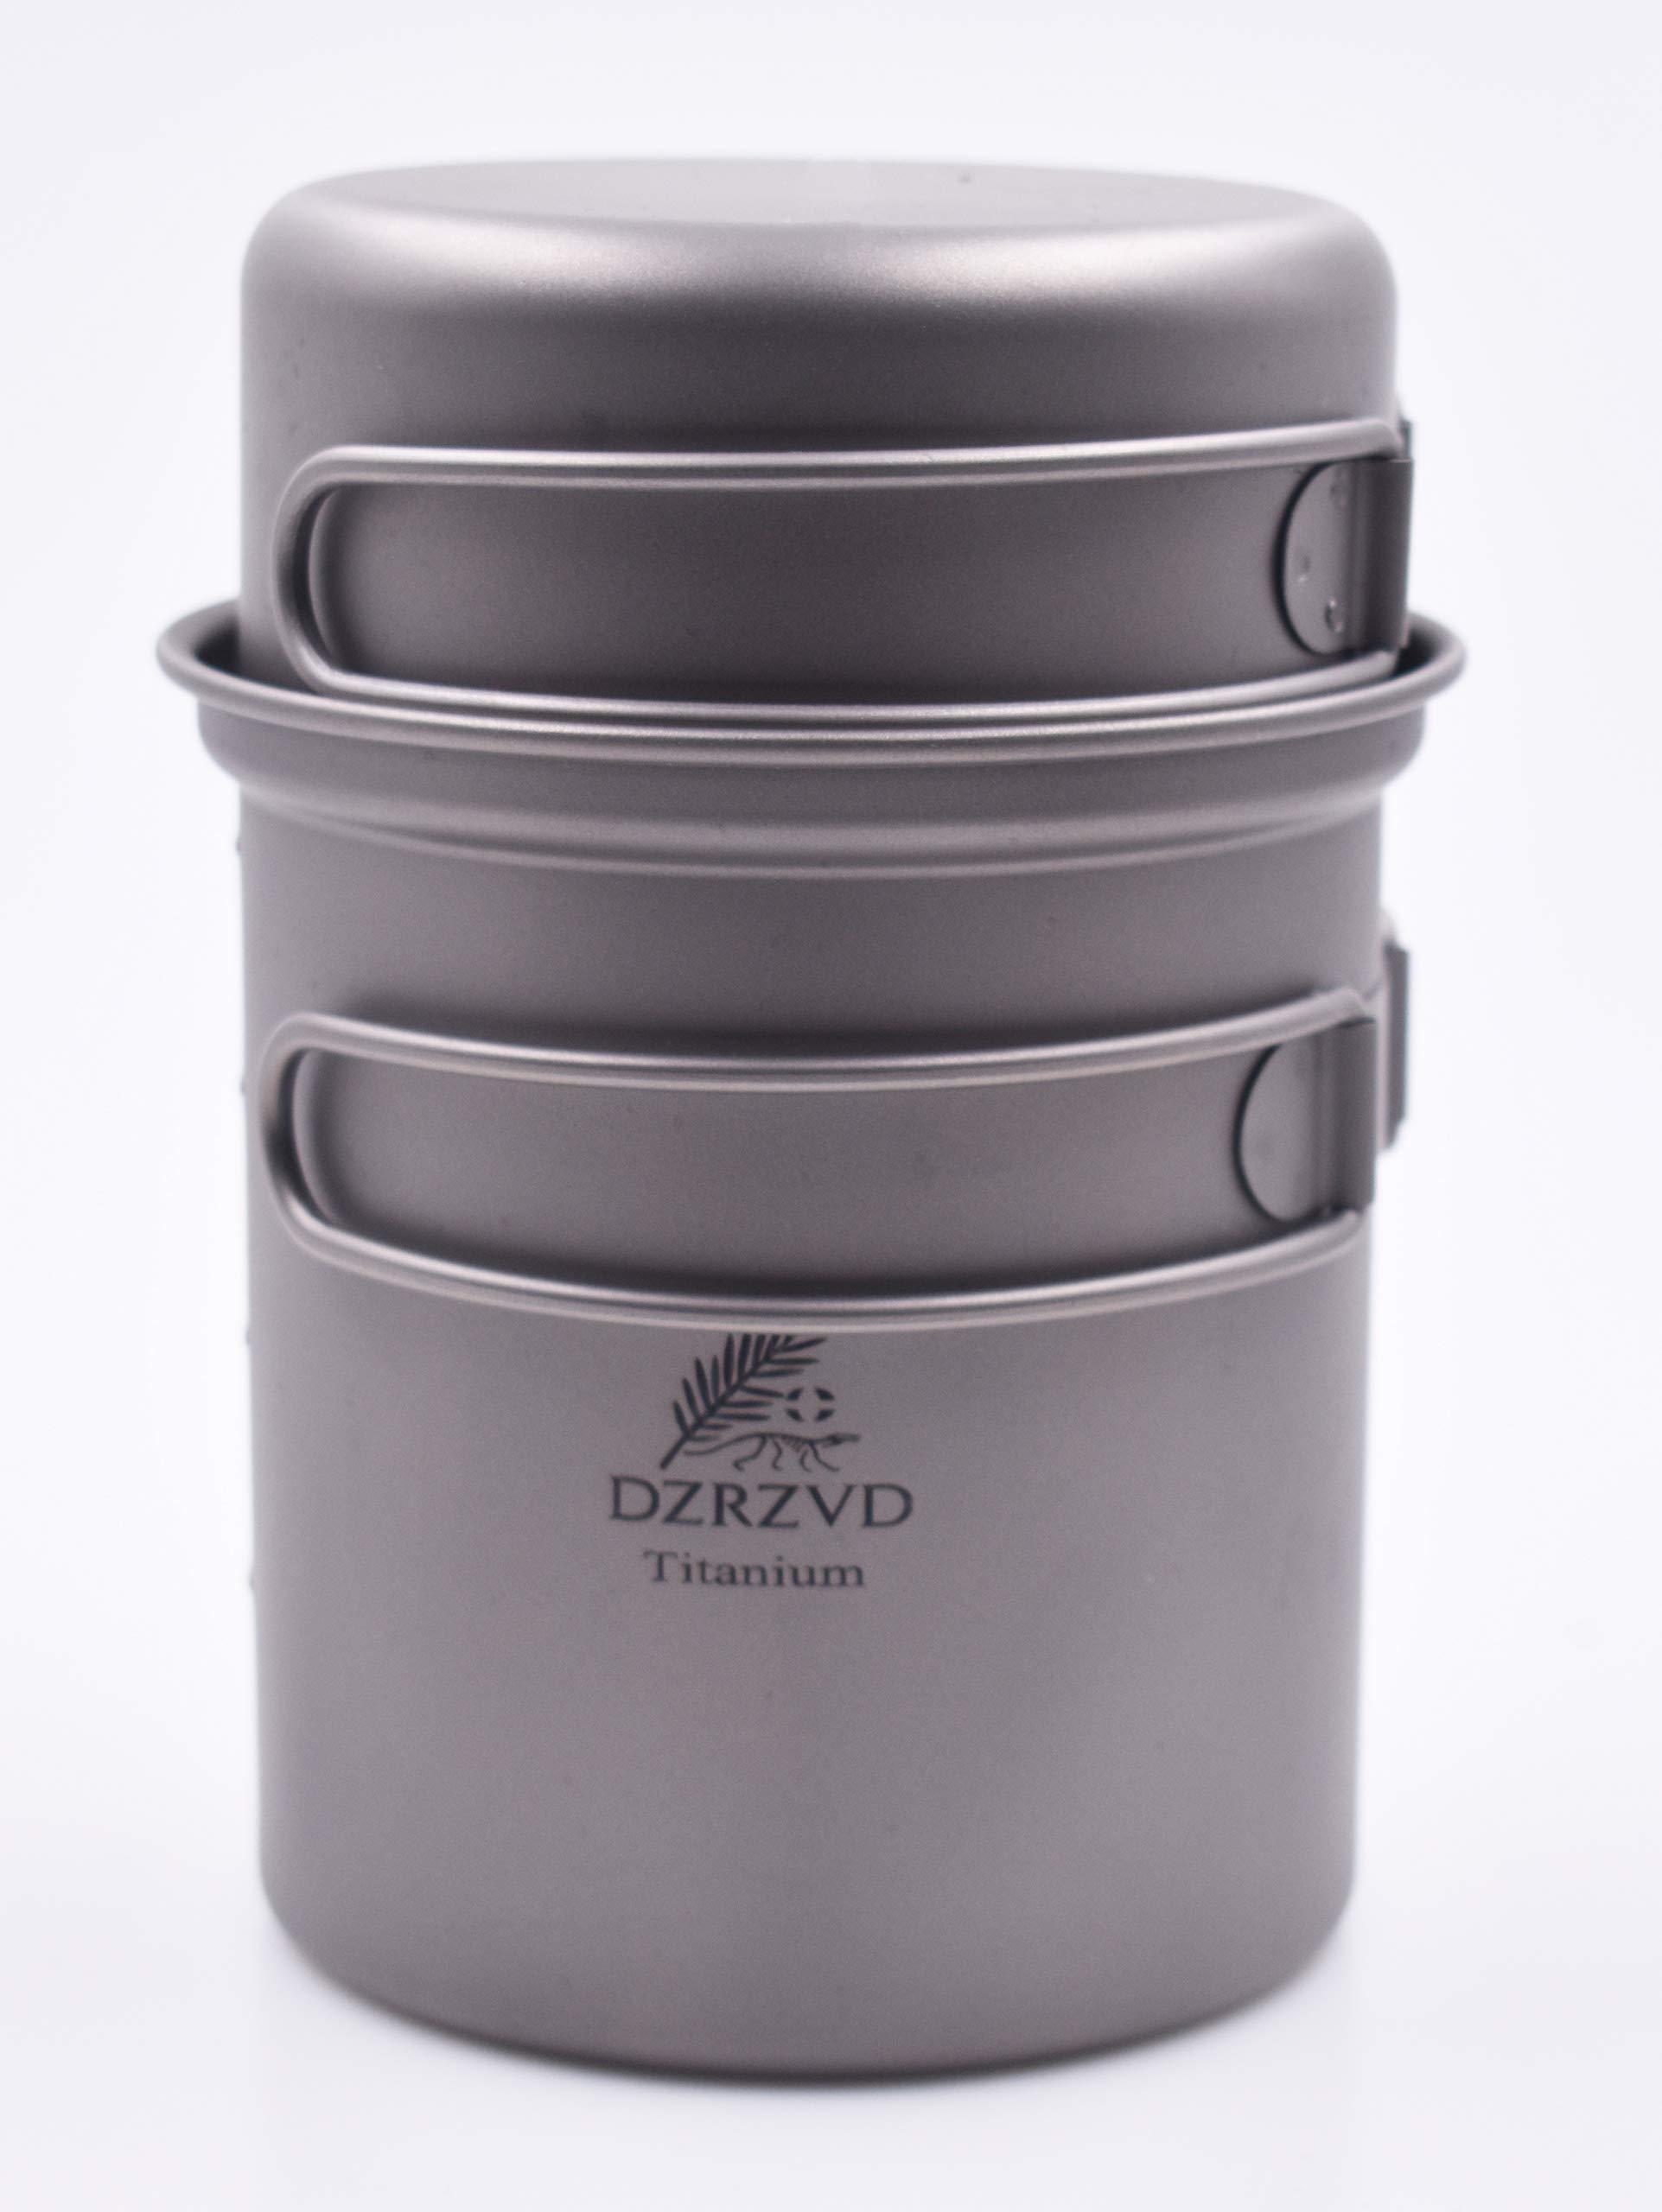 DZRZVD Titanium 600ml Pot with 300ml Pan